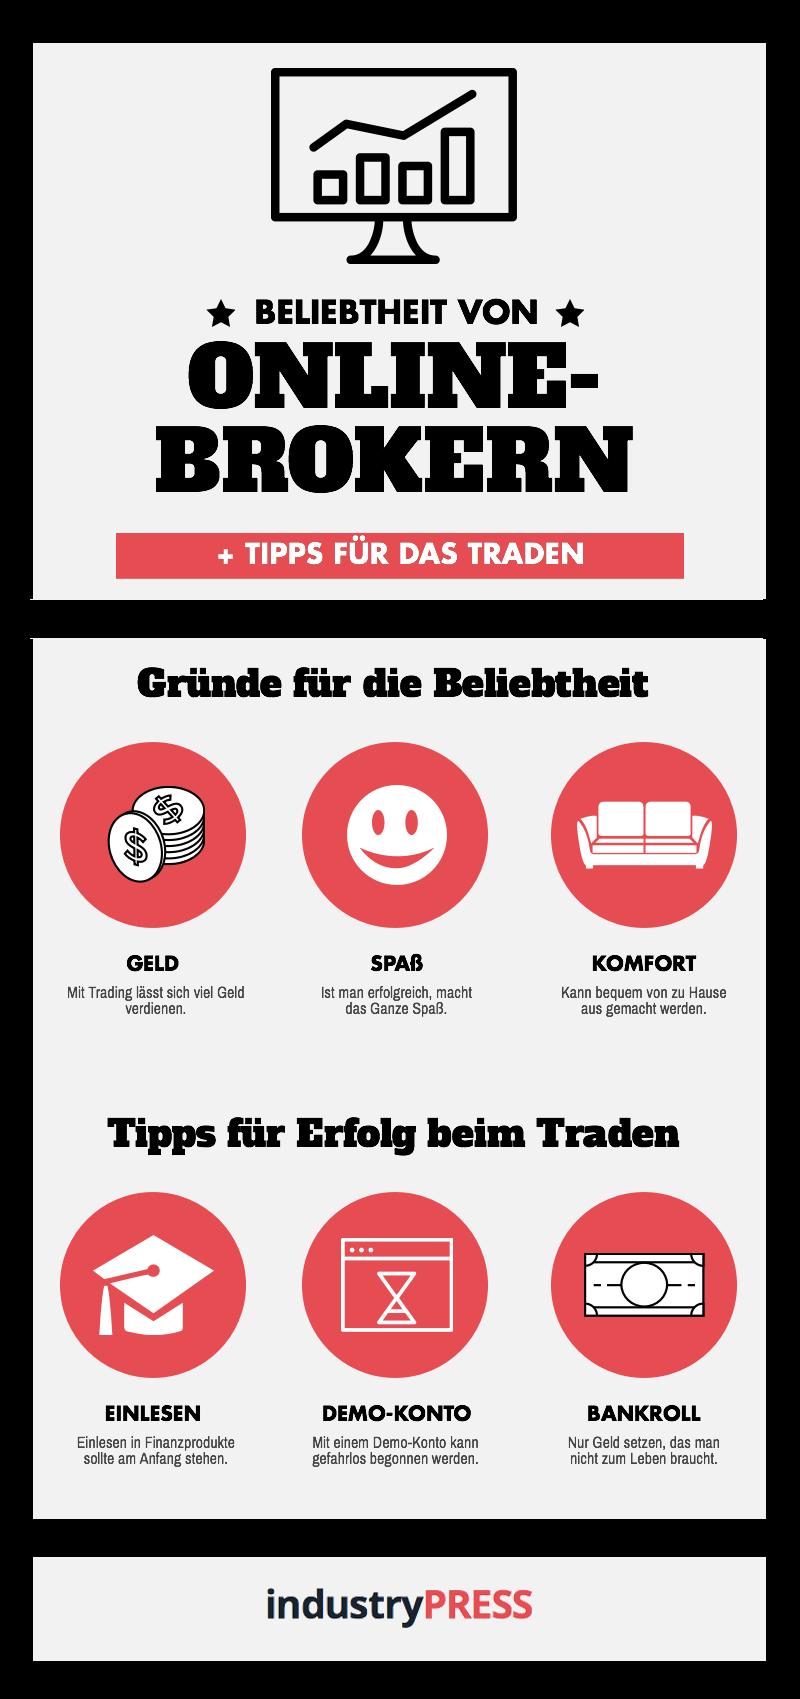 roulette 0 gewinn Recklinghausen